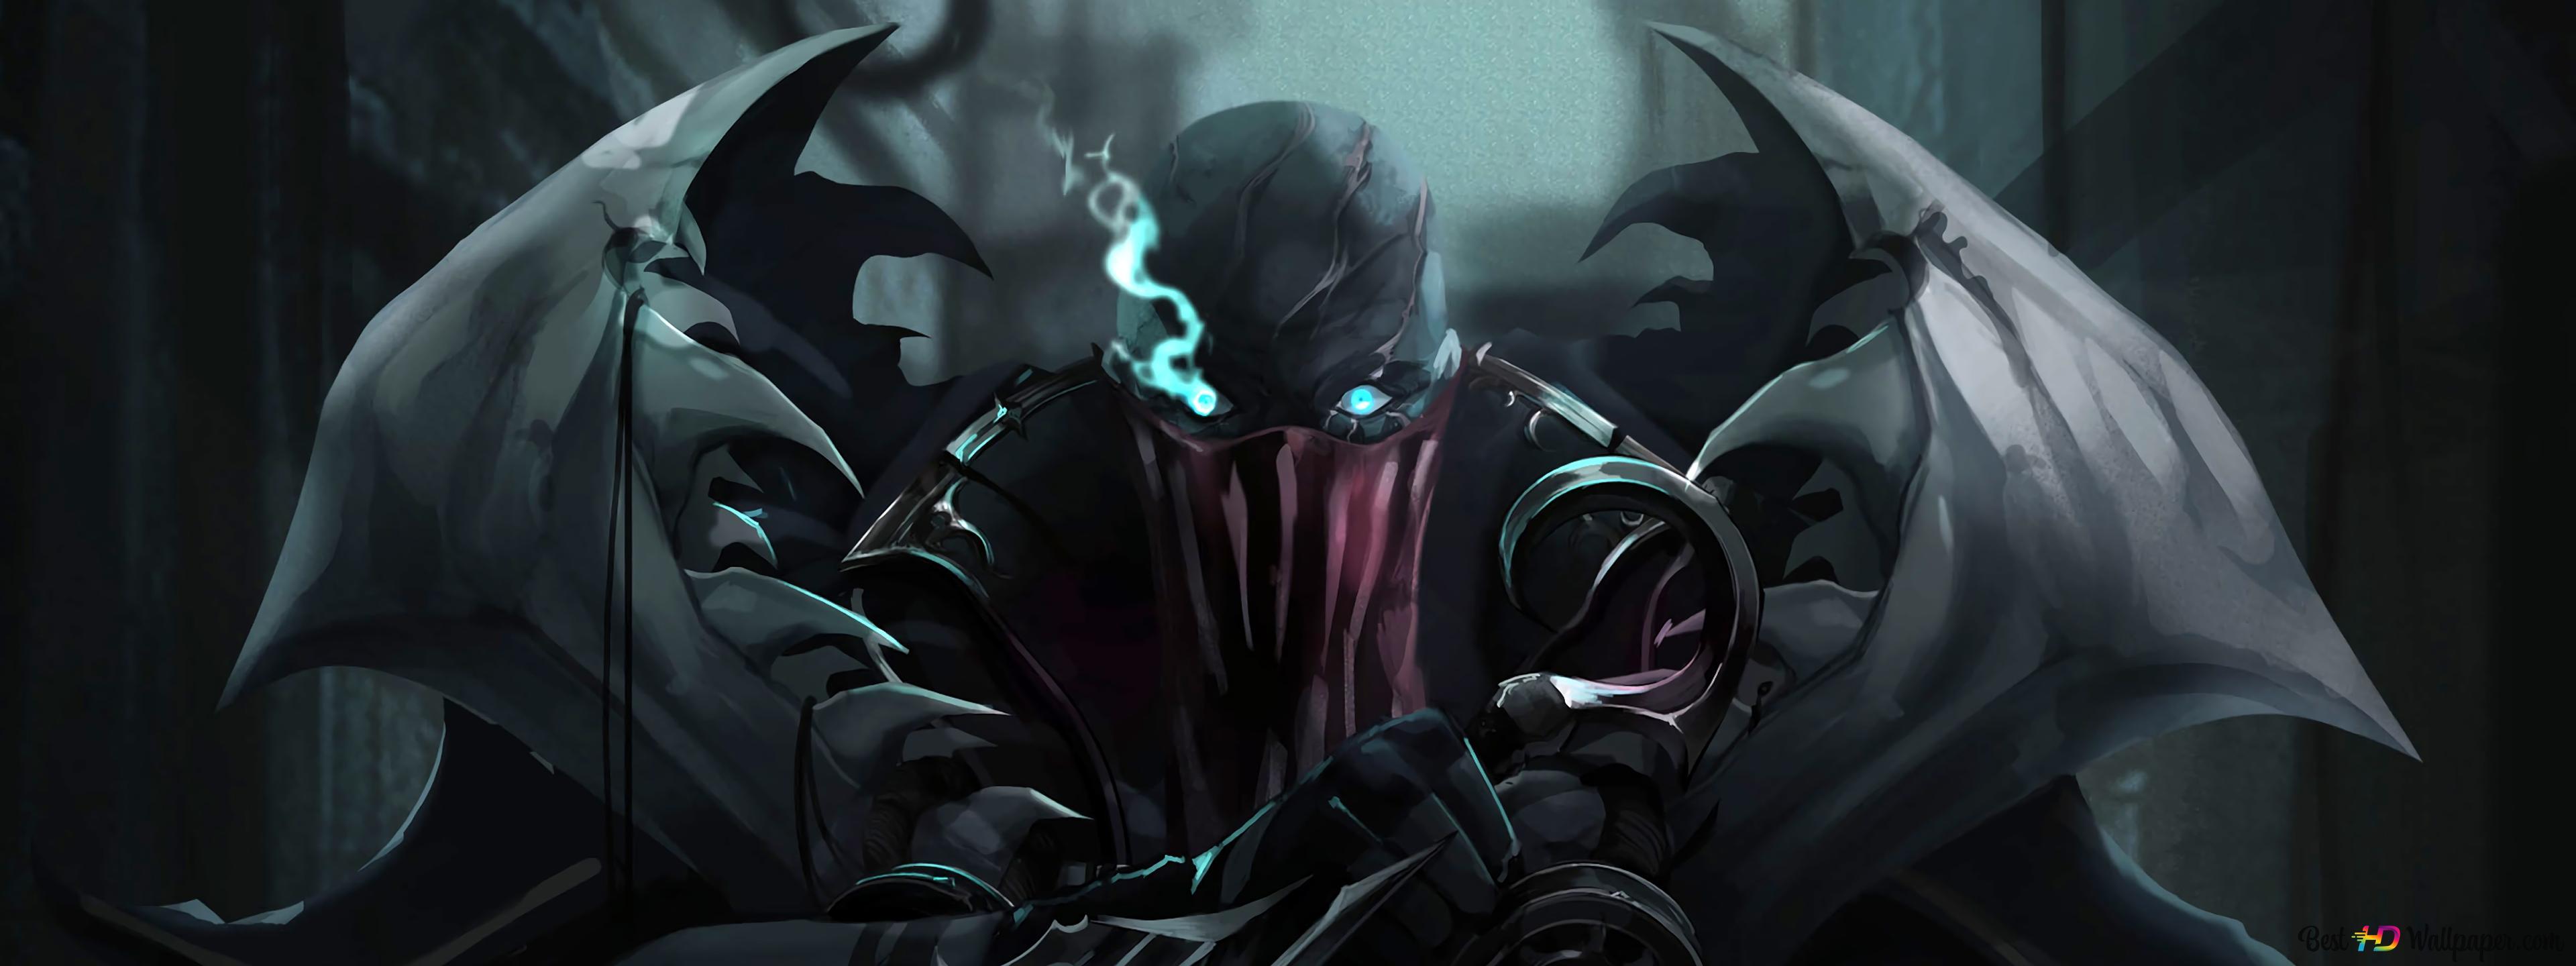 League Of Legends Pyke Hd Wallpaper Download